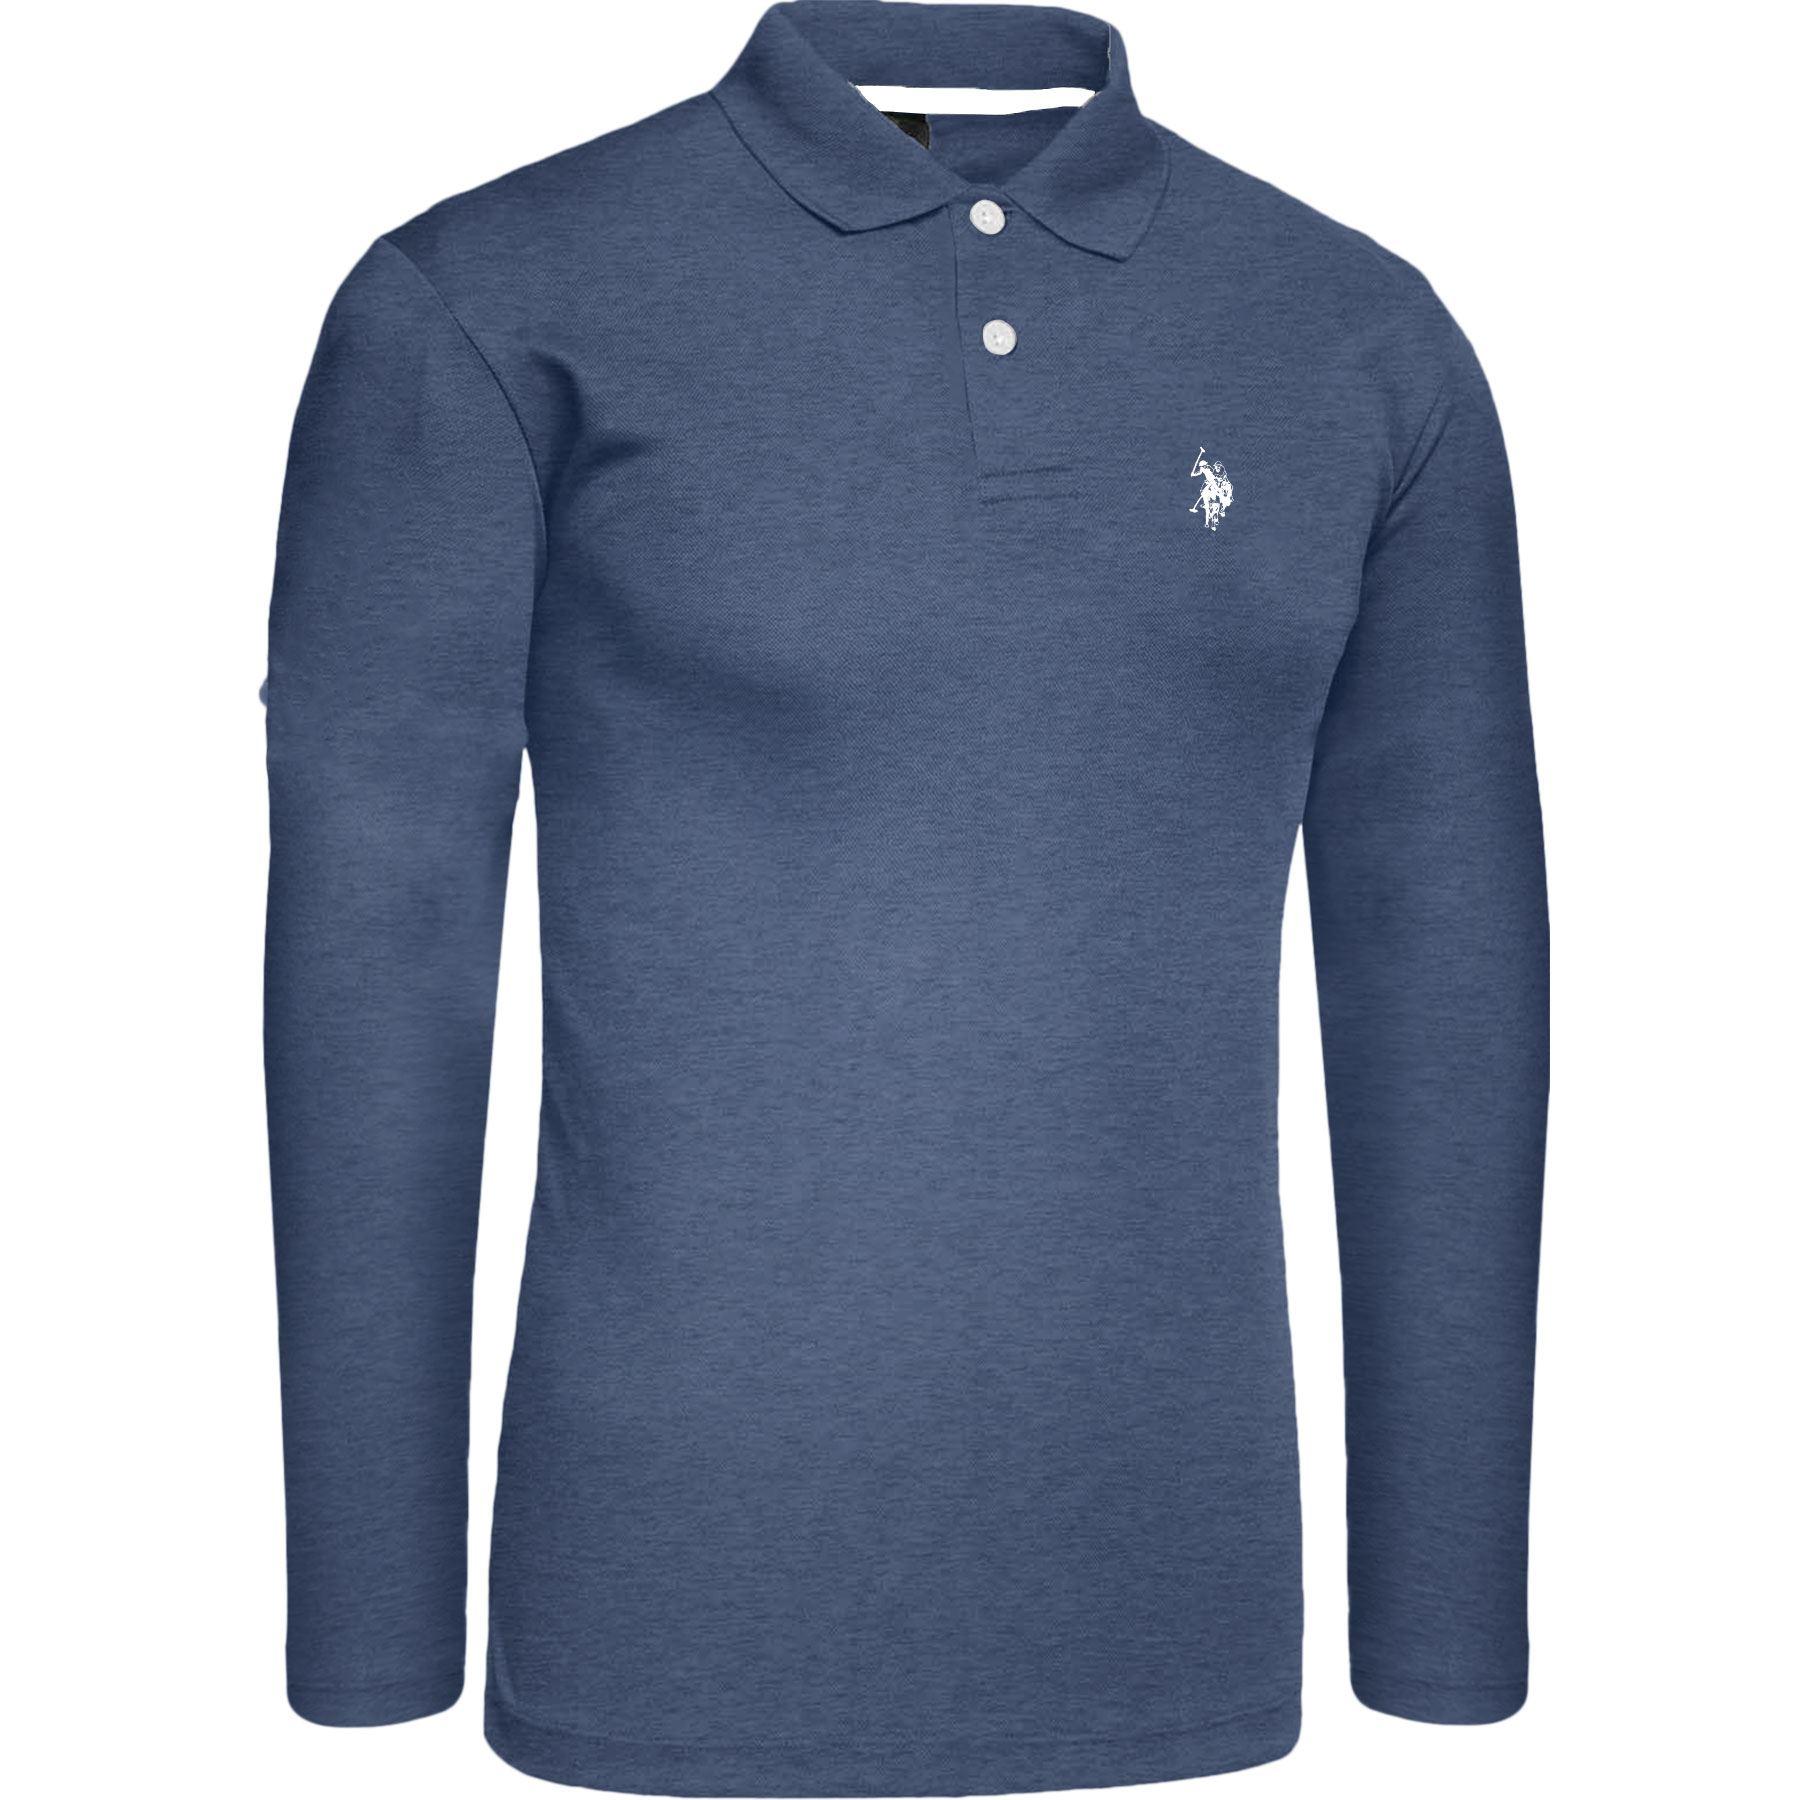 New-Mens-Branded-Long-Sleeve-Pique-Polo-Shirt-Small-Pony-Top-Denim-Blue